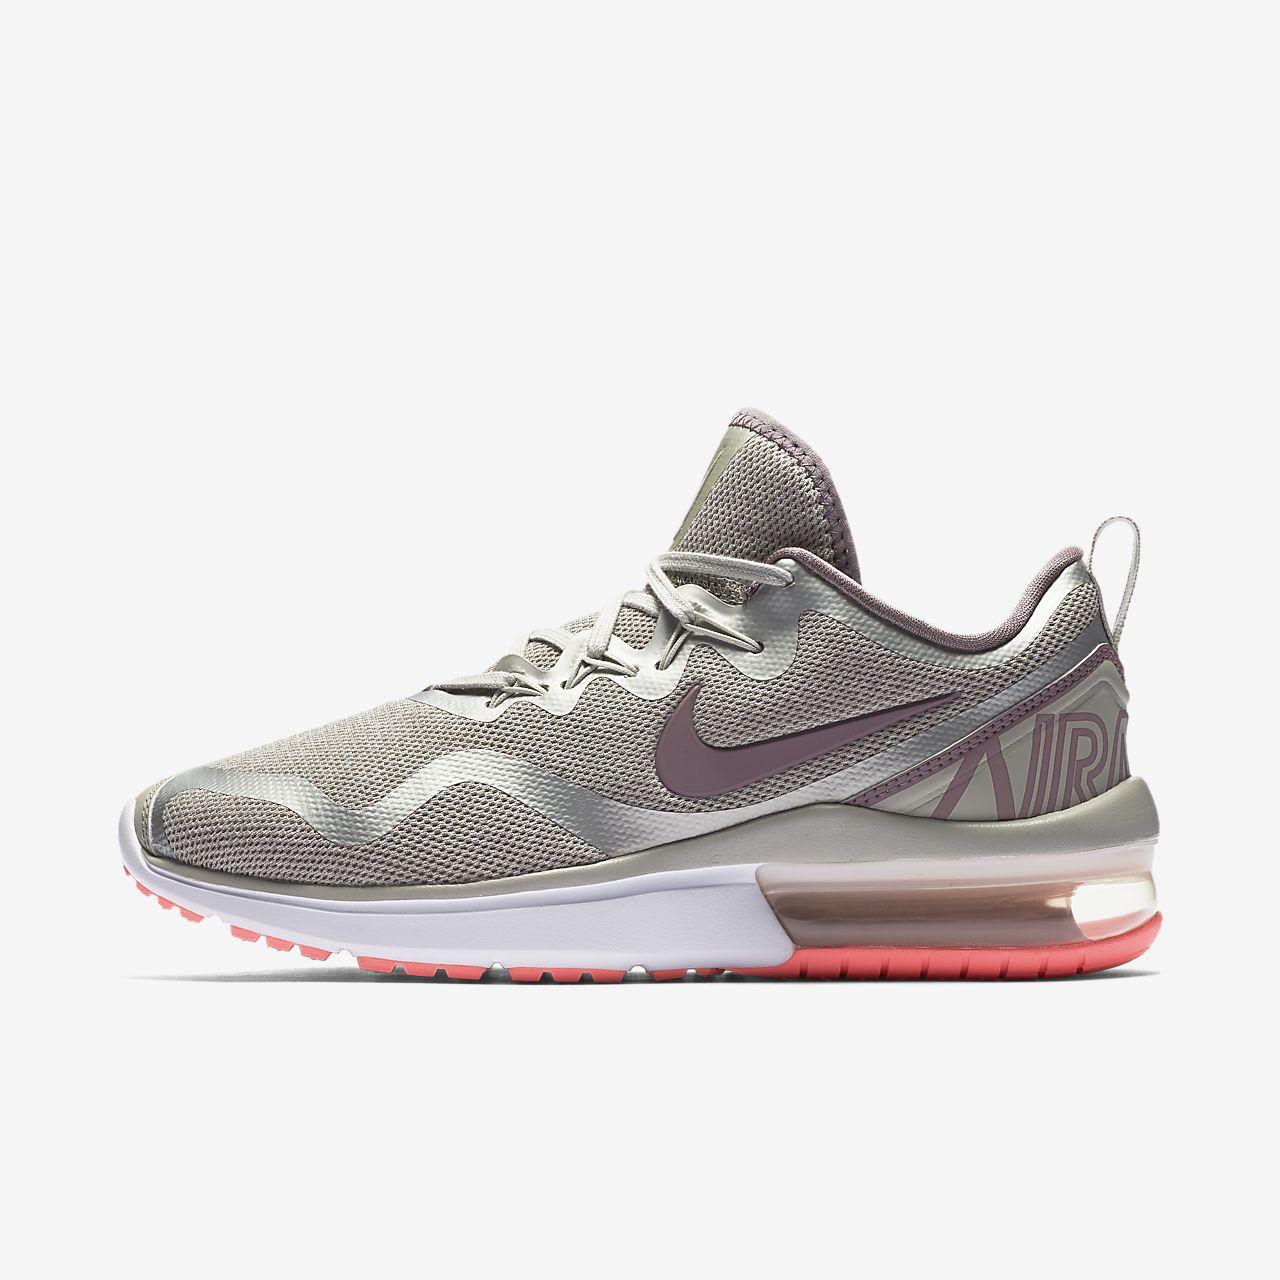 Nike Air Max Fury Damesschoen